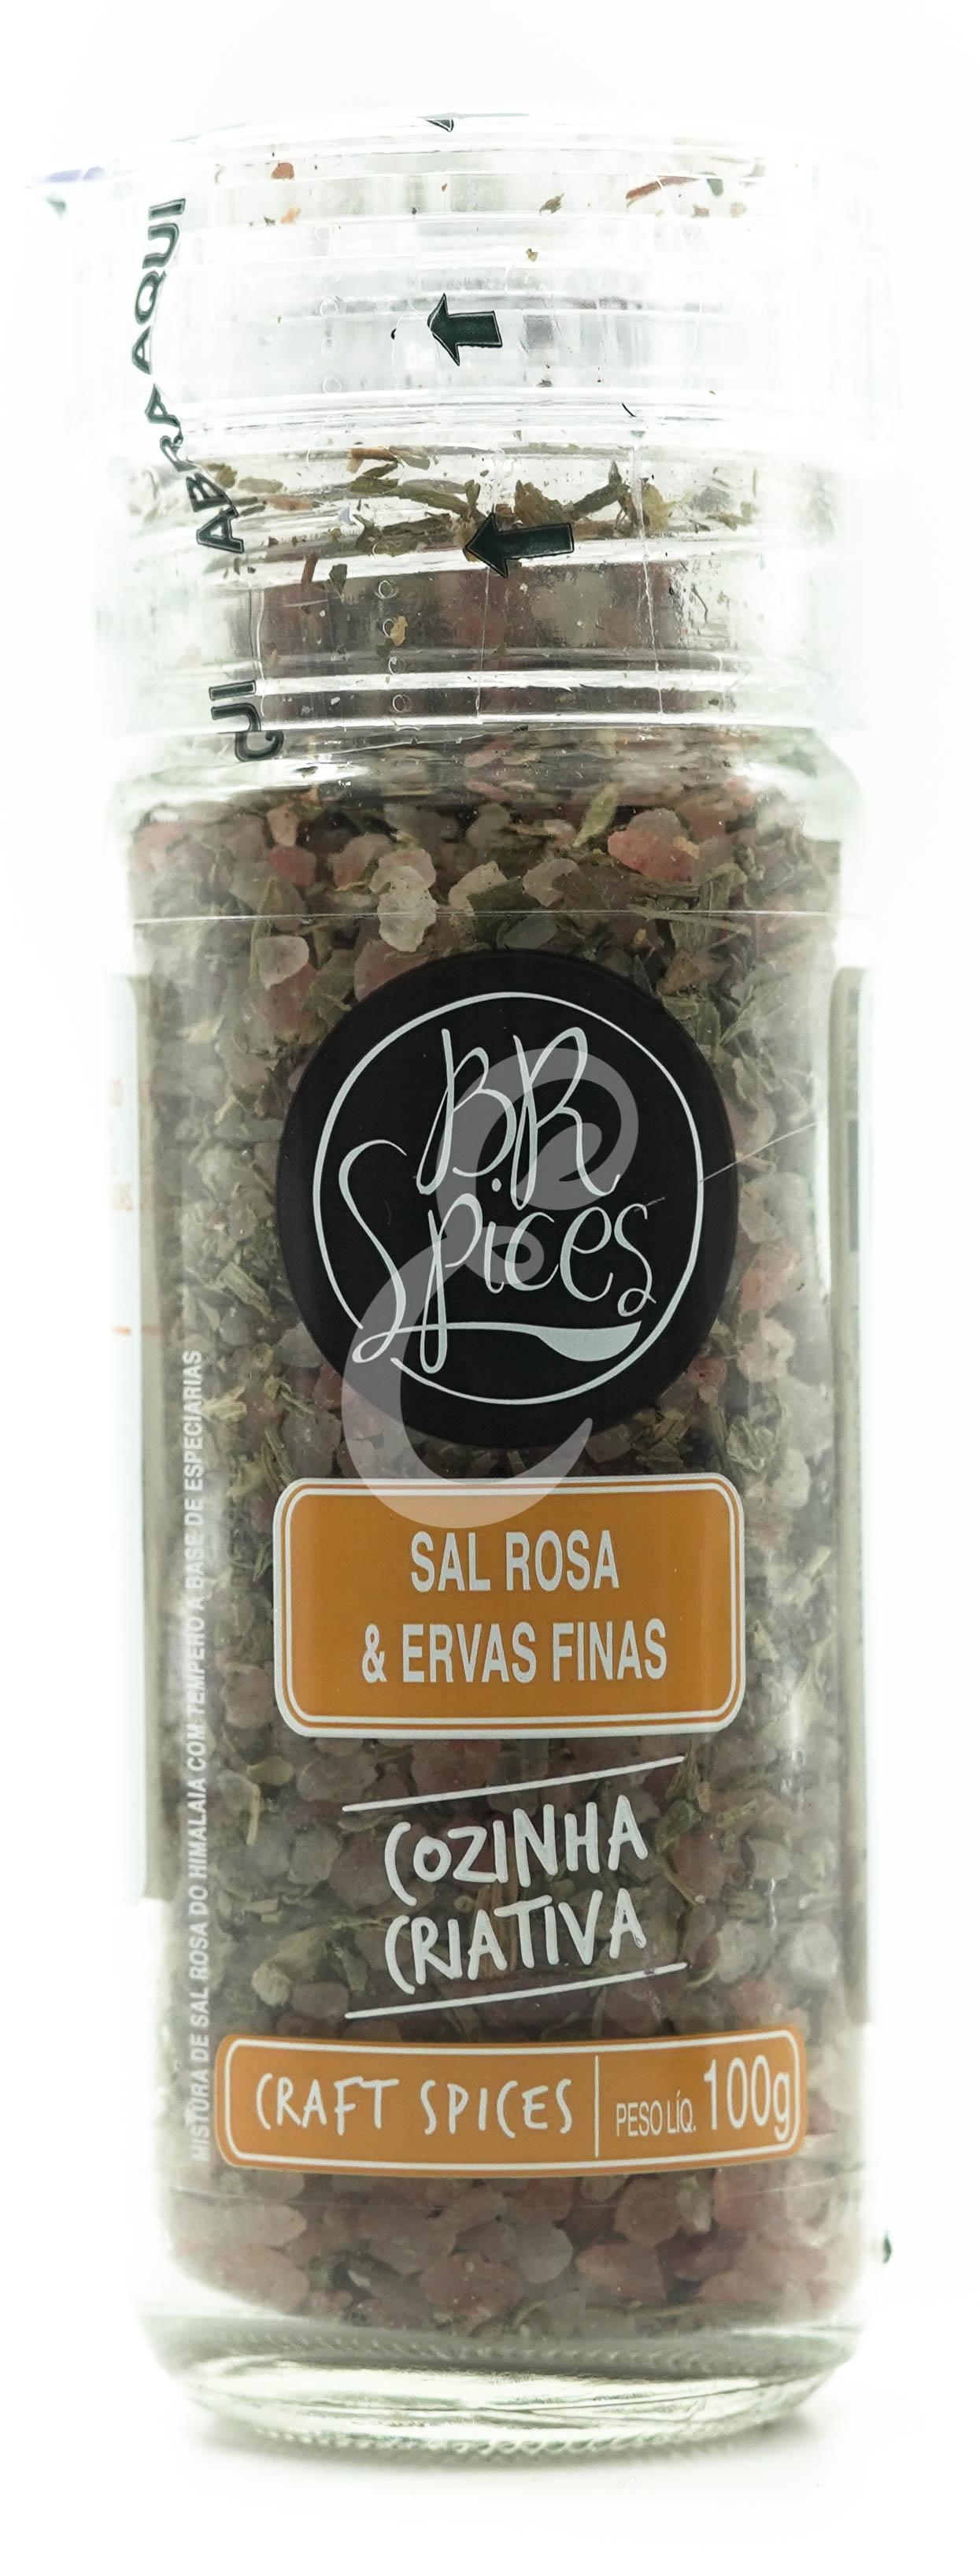 MOEDOR SAL ROSA & ERVAS FINAS 100g (Brspices)